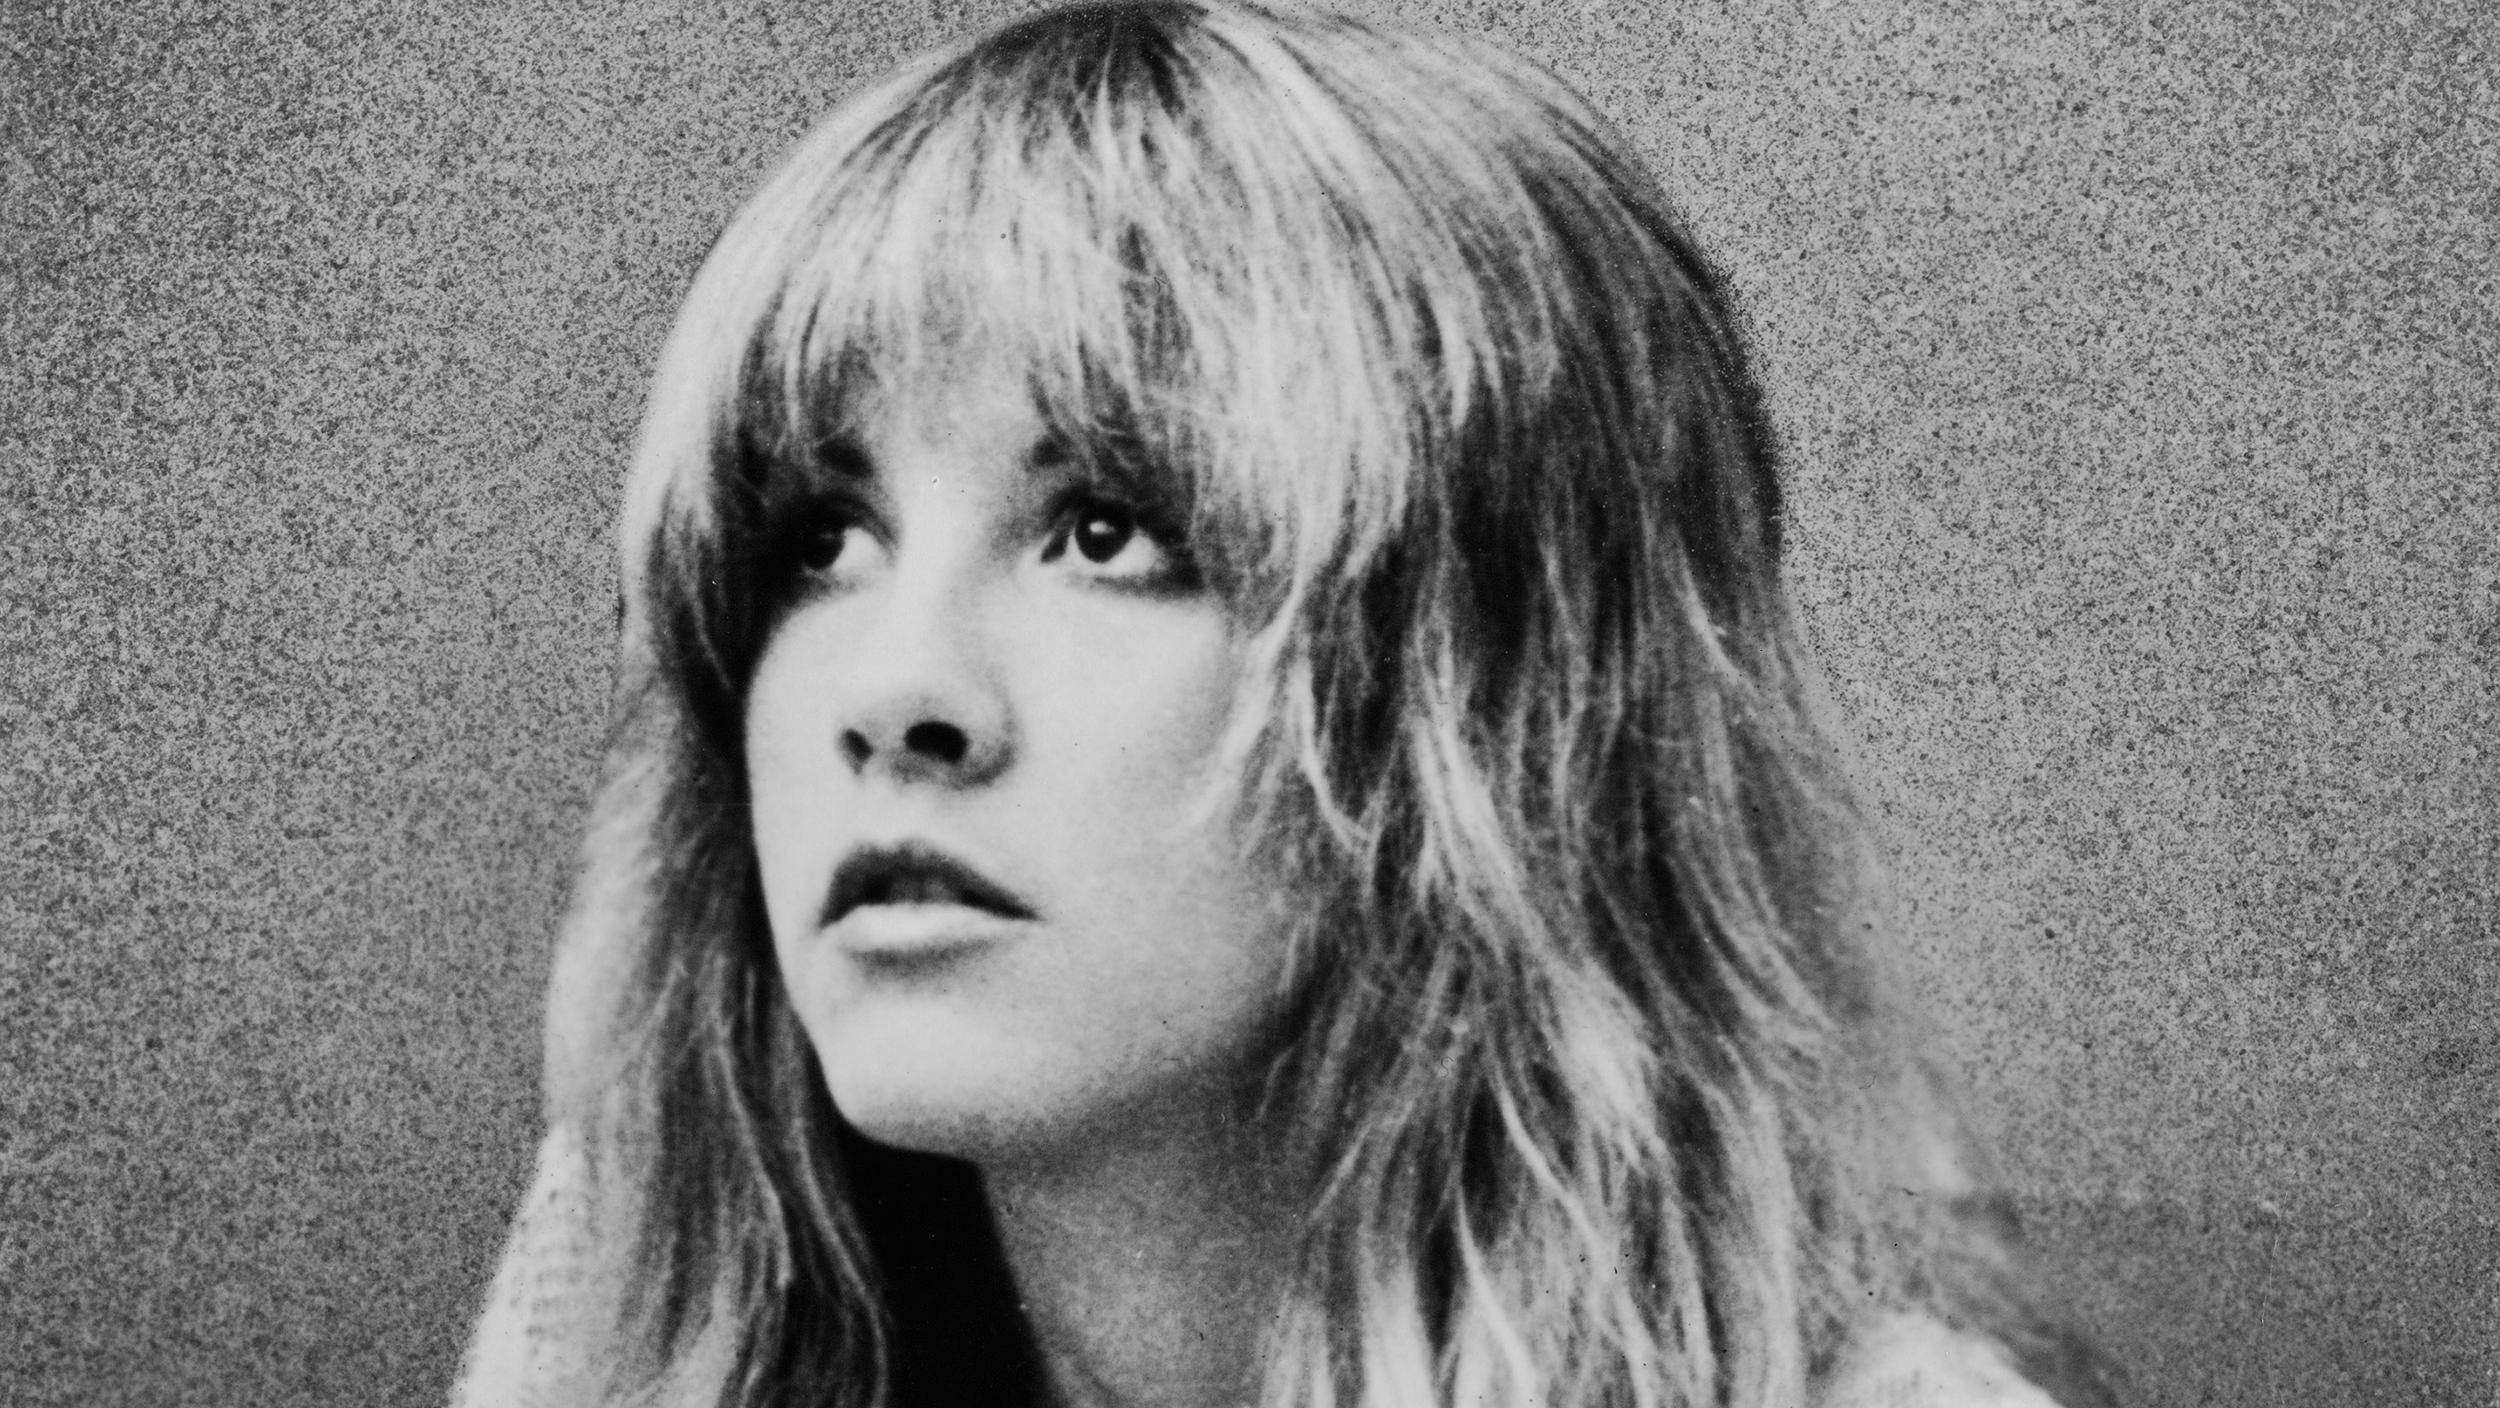 Stevie Nicks Bohemian Style A Staple Of Rock N Roll